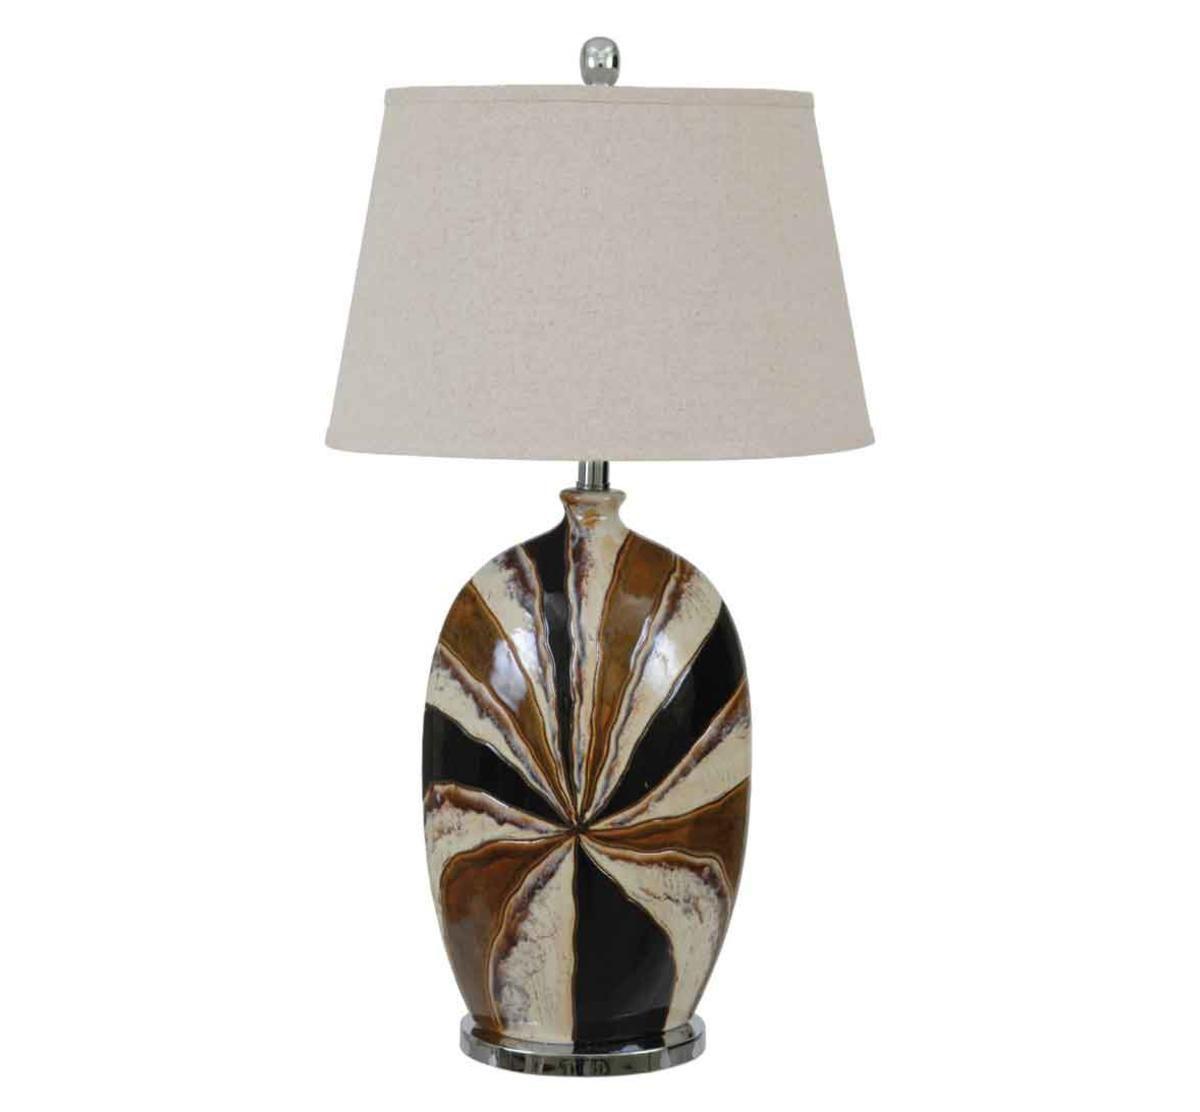 Picture of CASUAL CONTEMPORARY SUNBURST LAMP